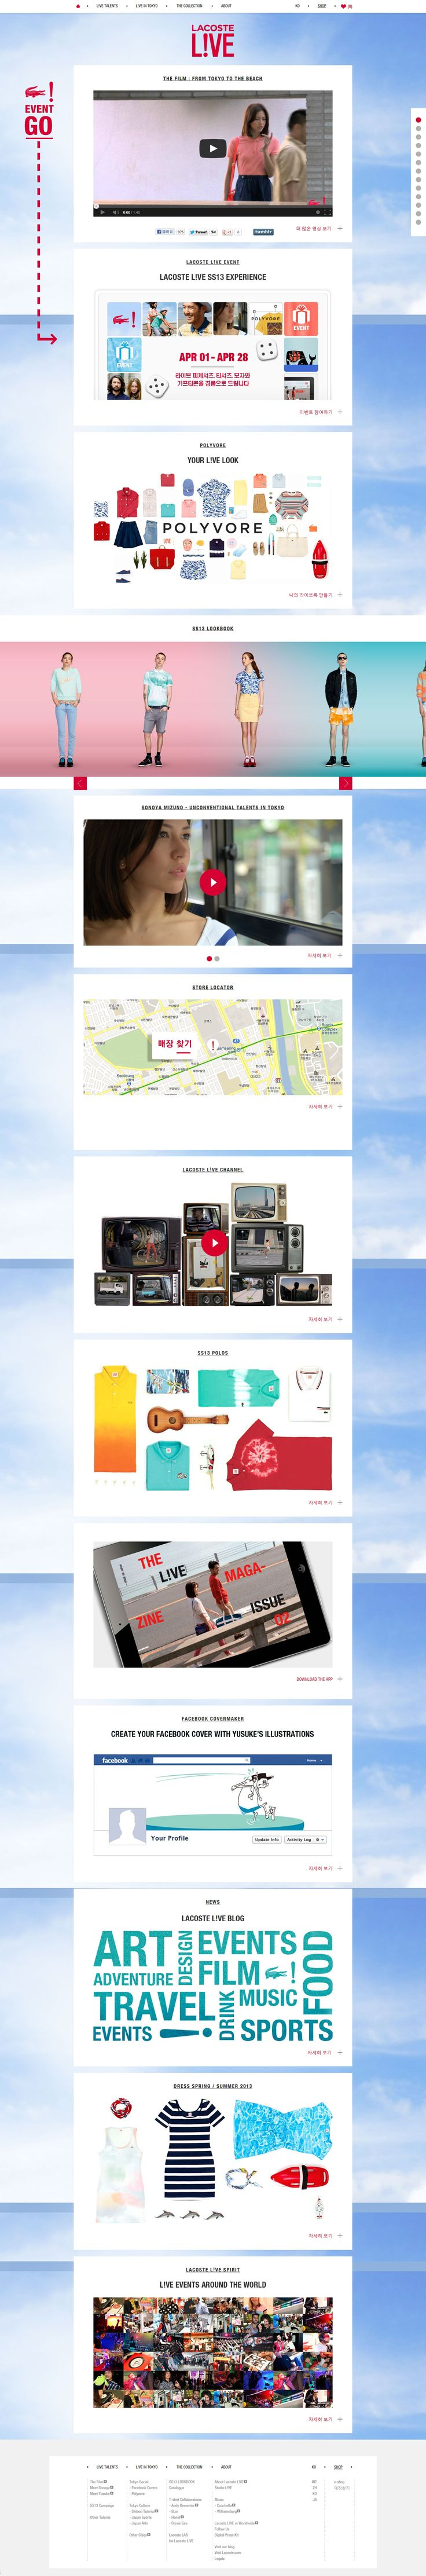 DCafeIn Website - Lacoste Live